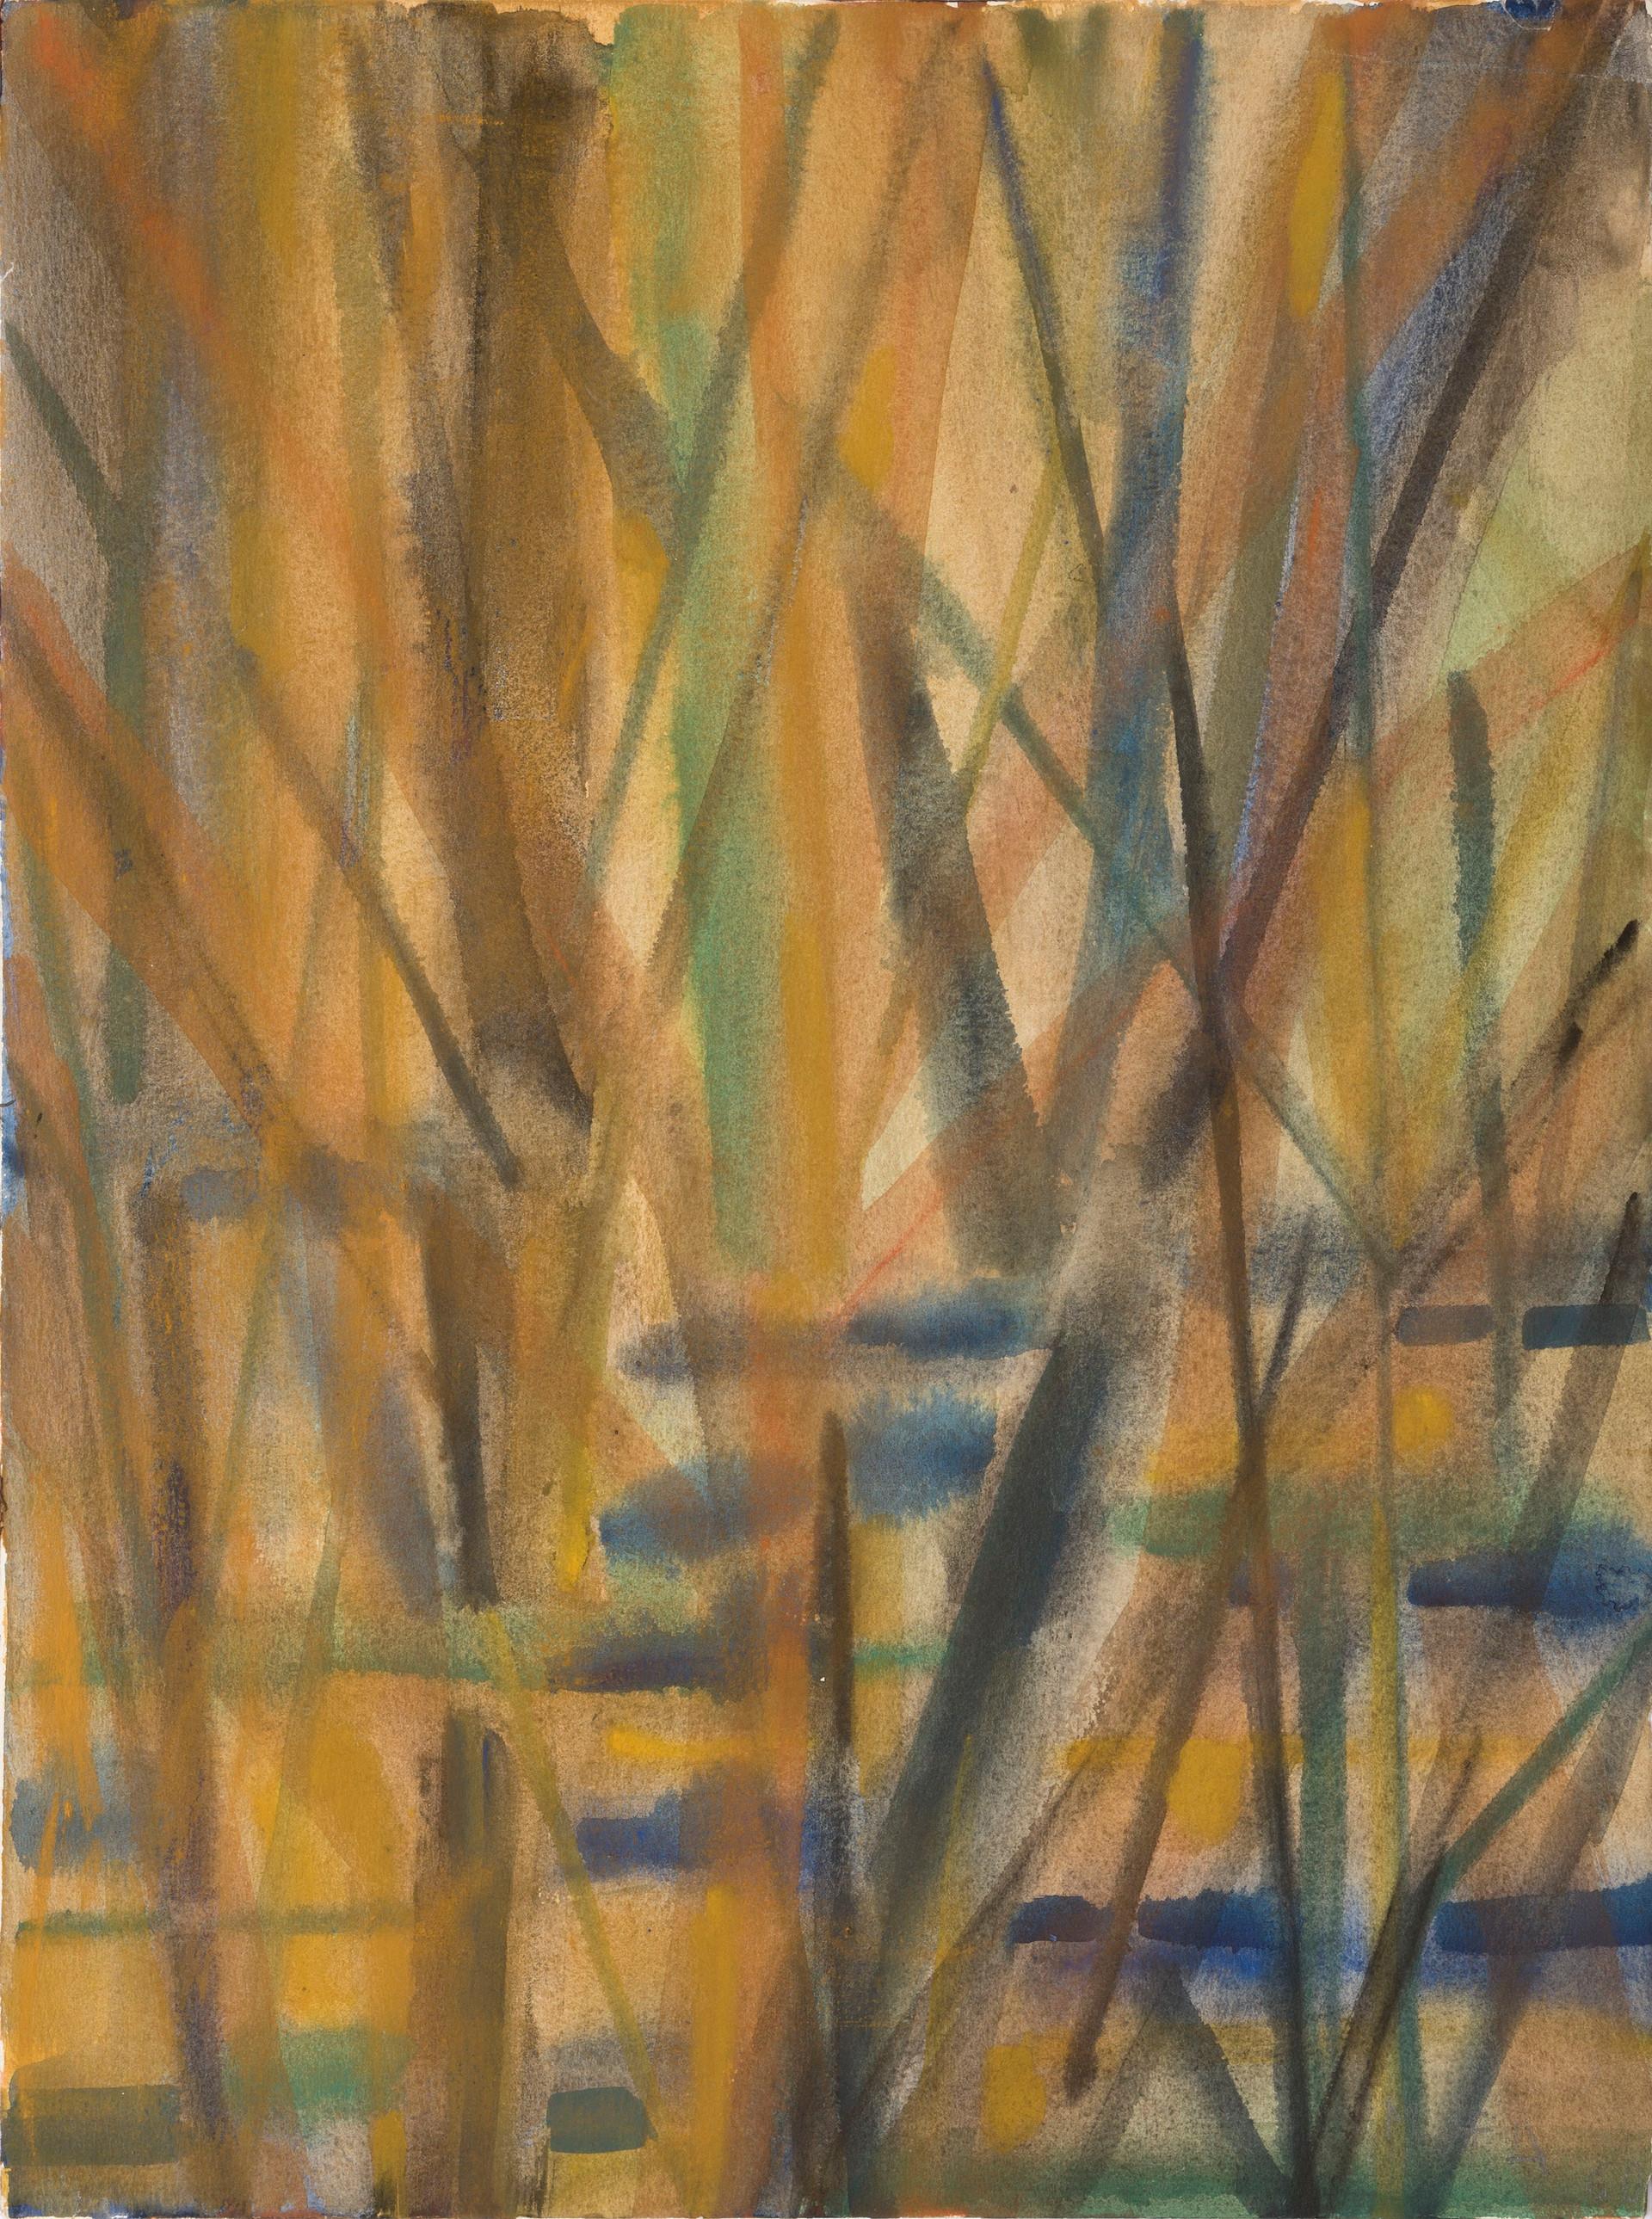 Untitled - autumn woods